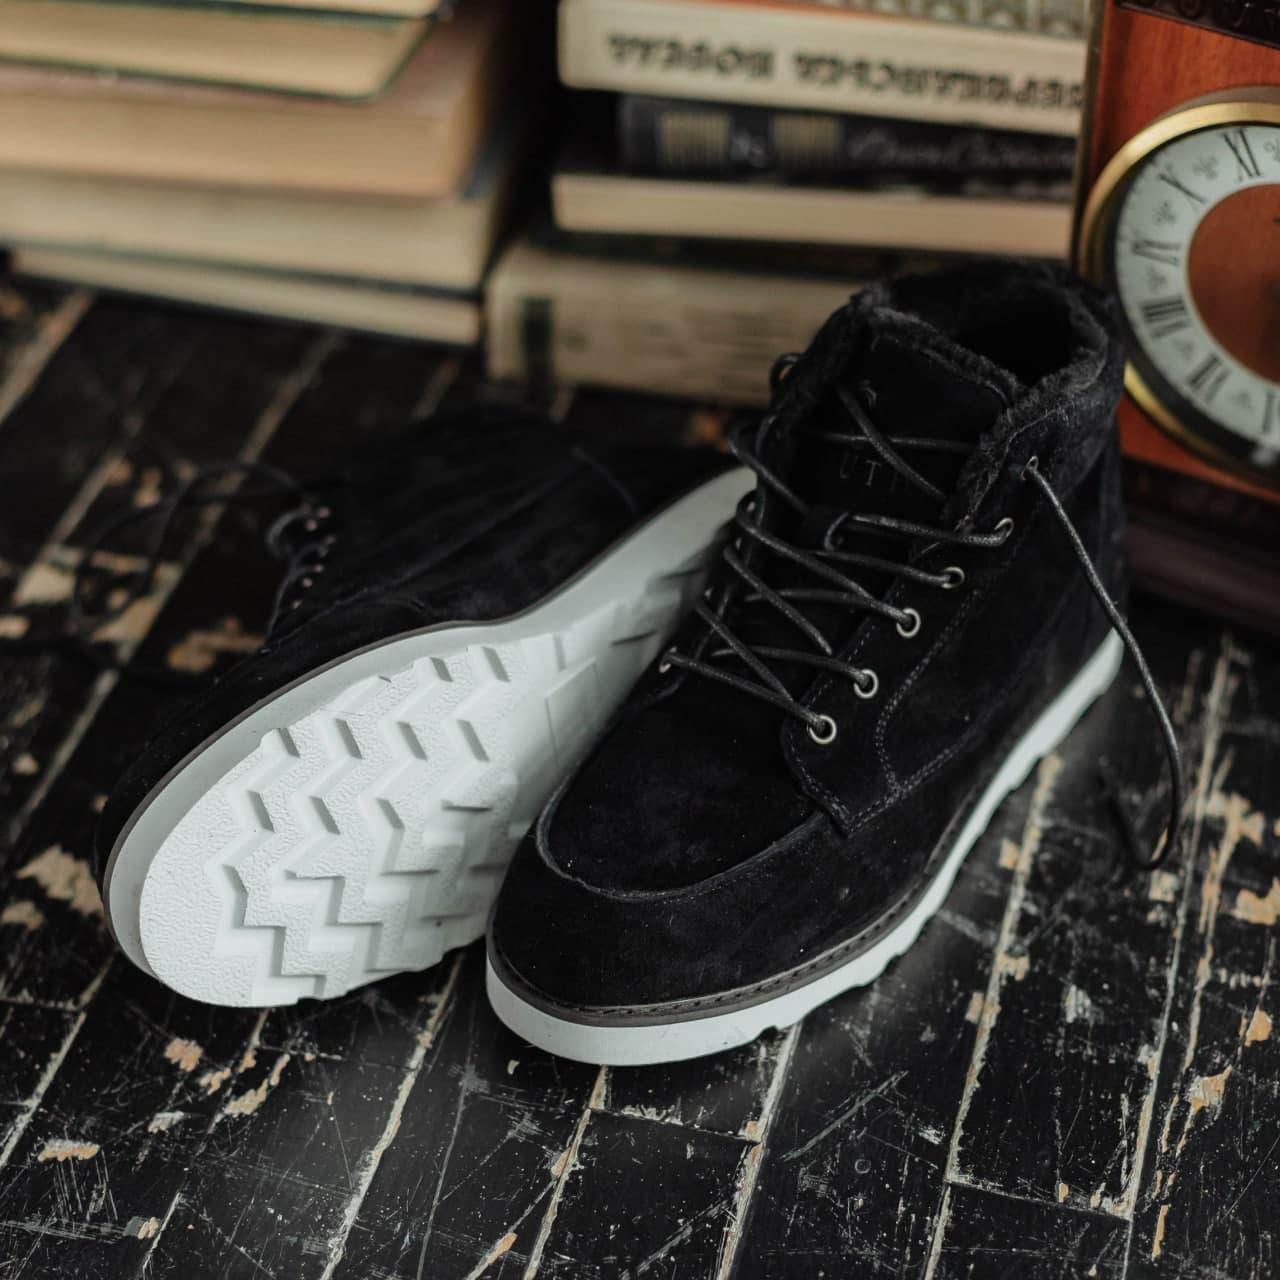 Ботинки South indigo black - фото 3